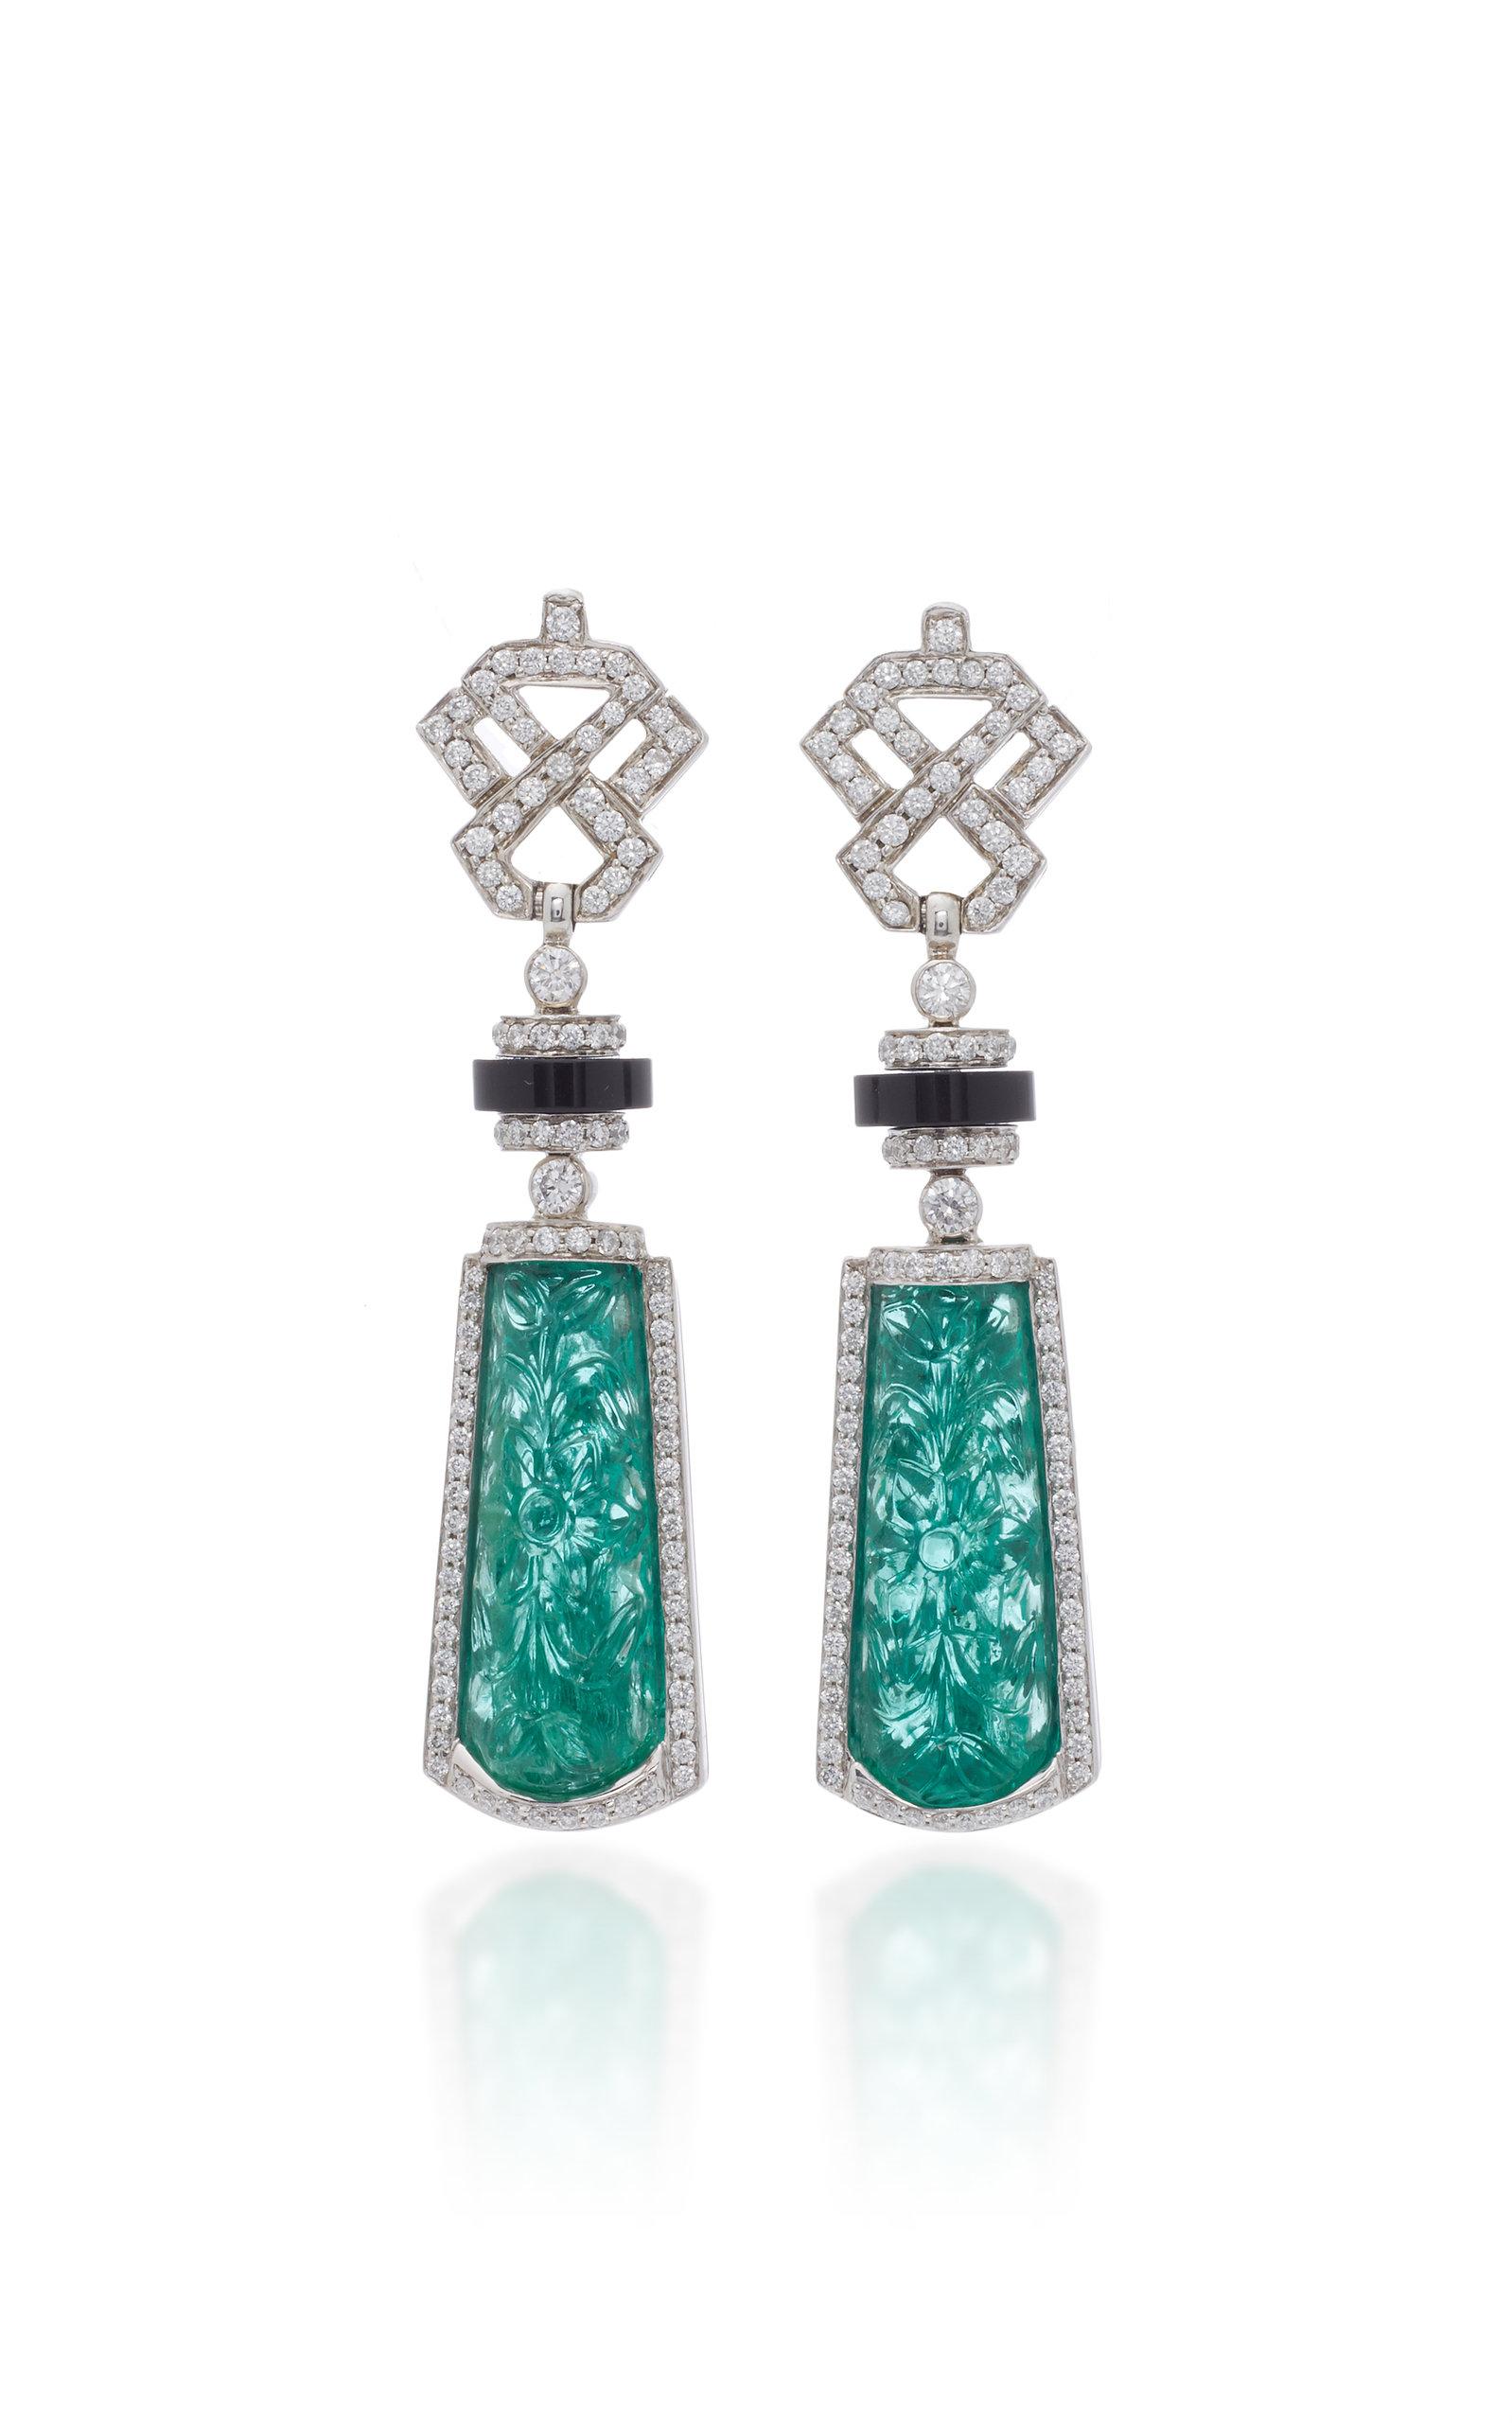 GOSHWARA Platinum Emerald And Diamond Earrings in Green